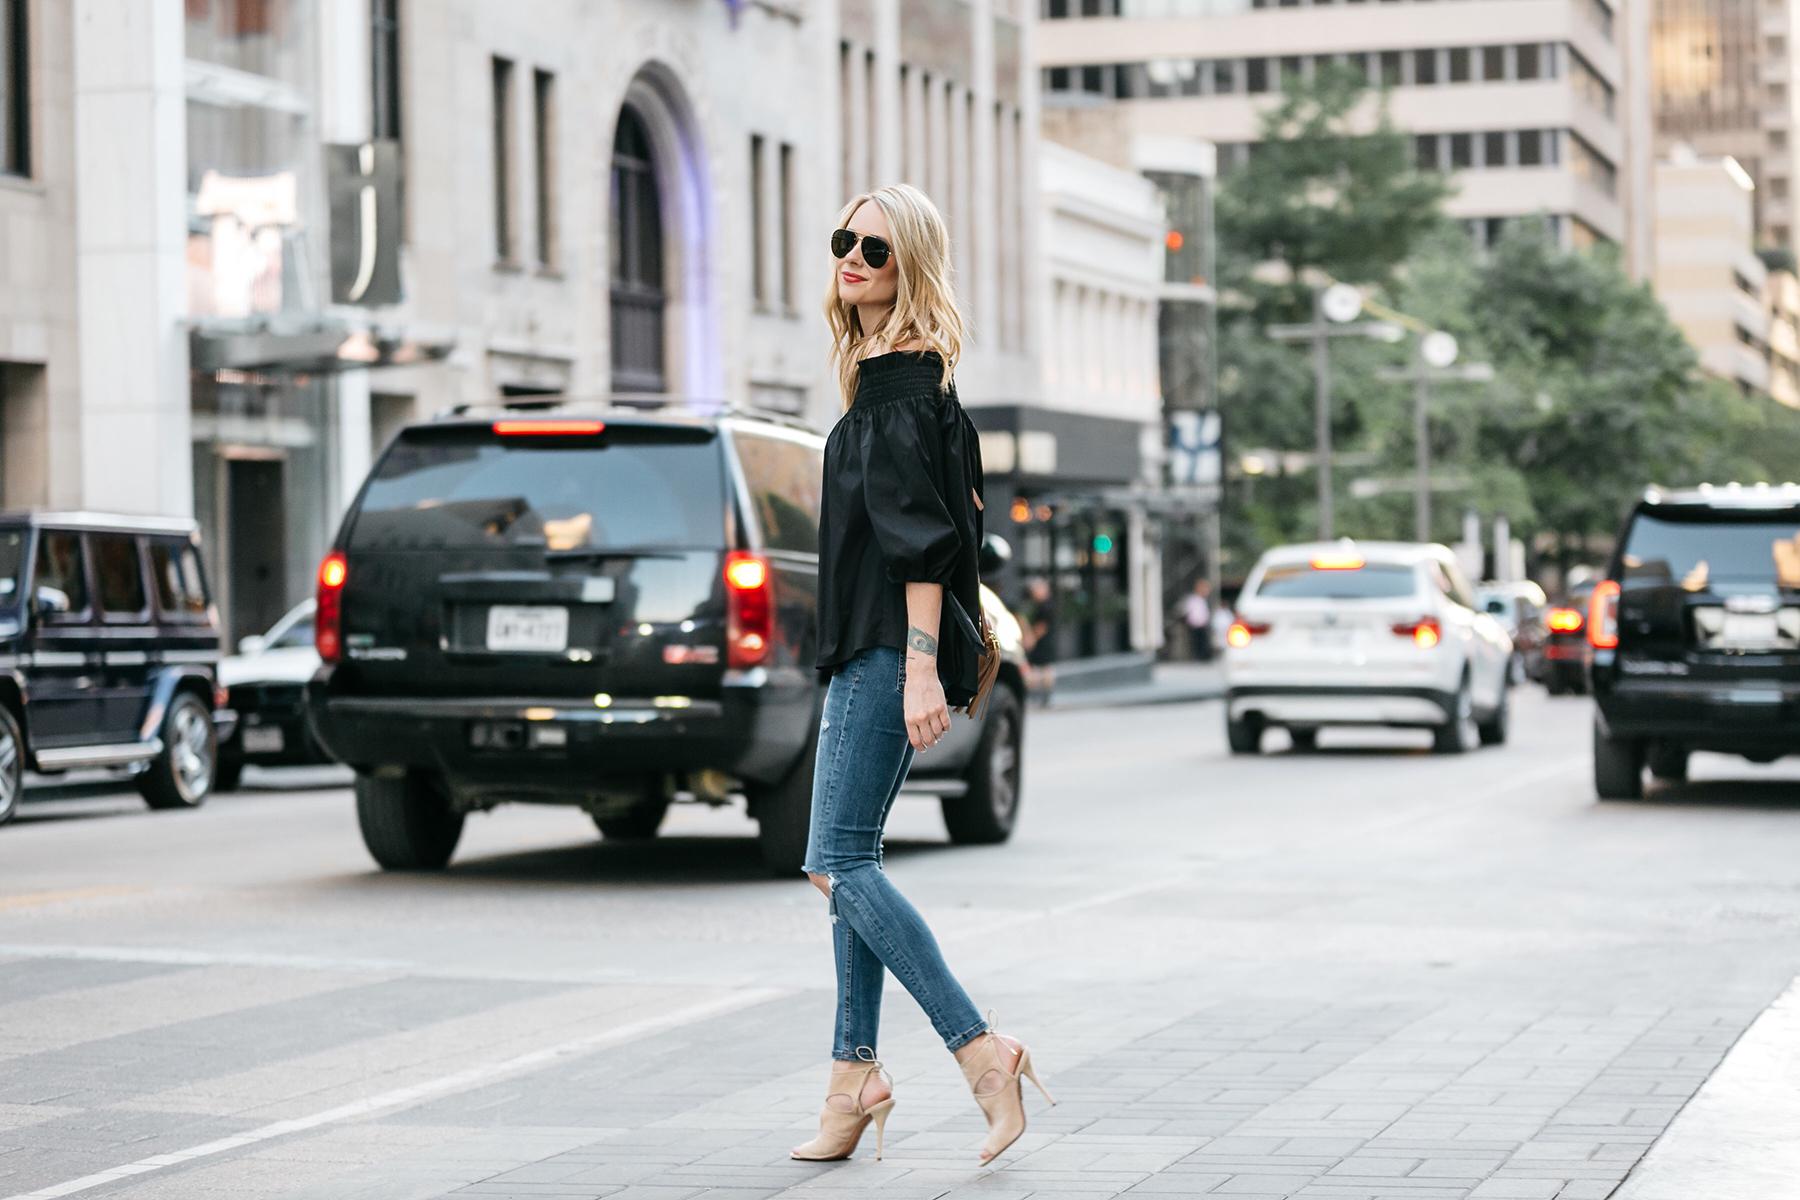 Fashion Jackson, Dallas Blogger, Fashion Blogger, Street Style, Caroline Constas Lou Off the Shoulder Top Black, Denim Ripped Skinny Jeans, Gucci Soho Disco Crossbody, Aquazzura Sexy Thing Cut Out Heels